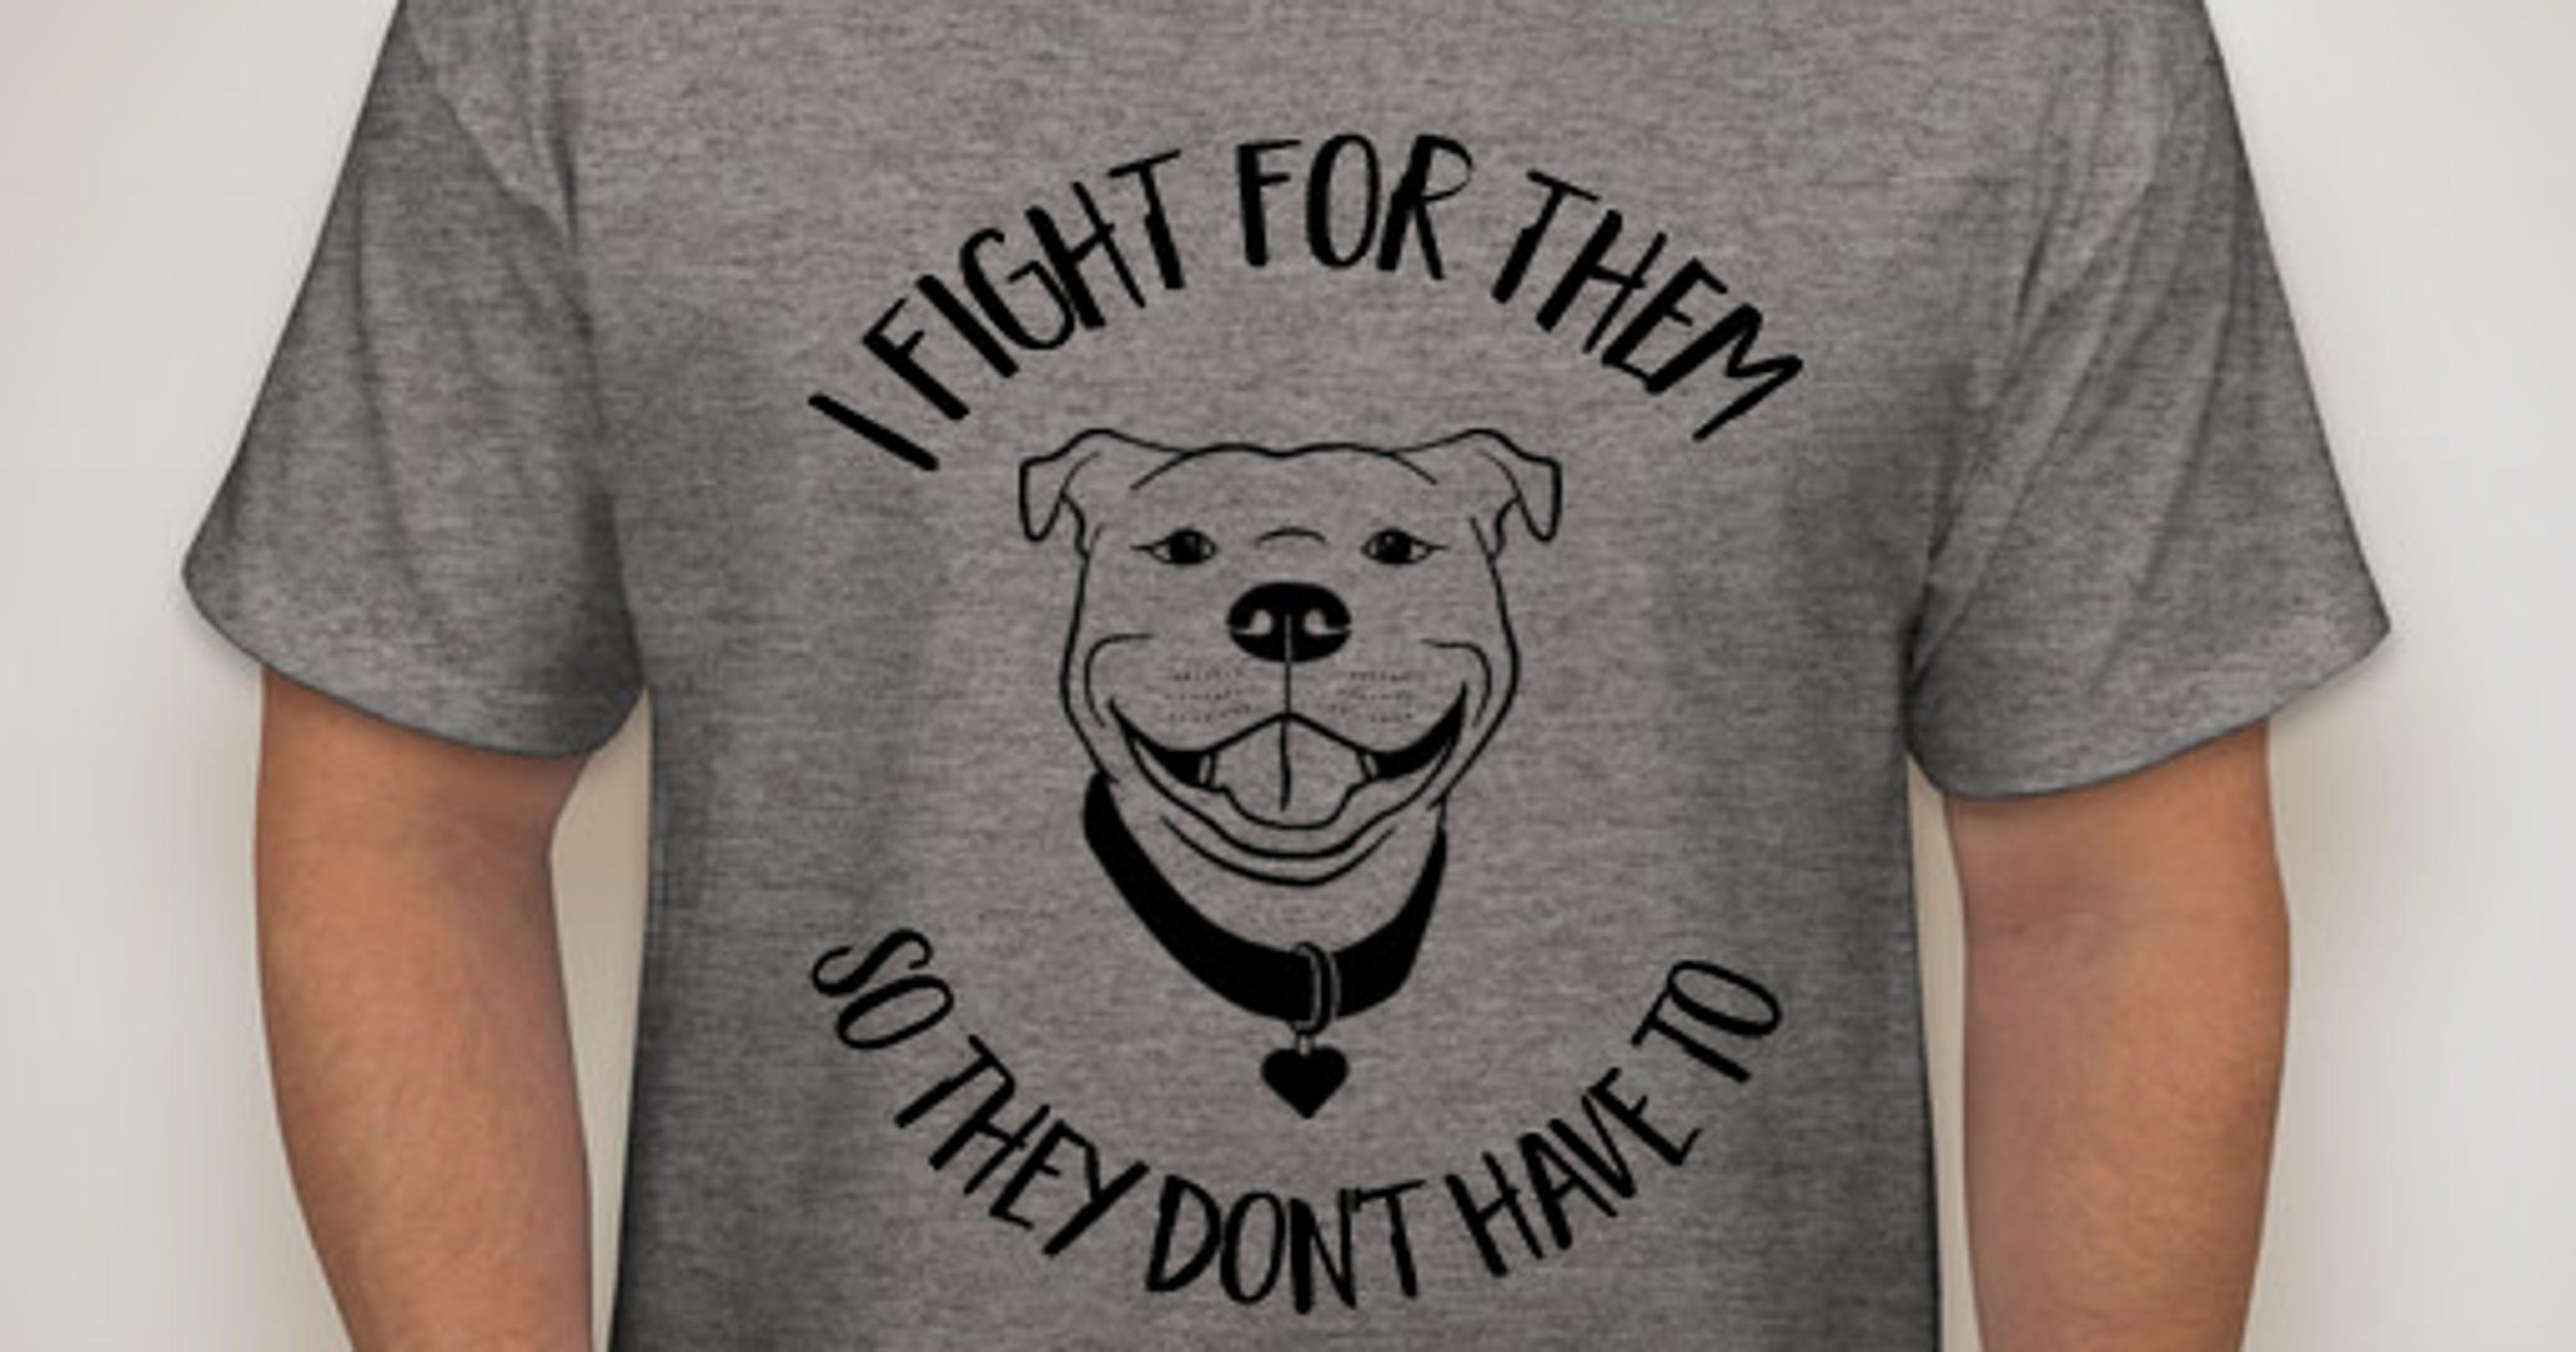 Effort to save 53 pit bulls, dogfighting investigation